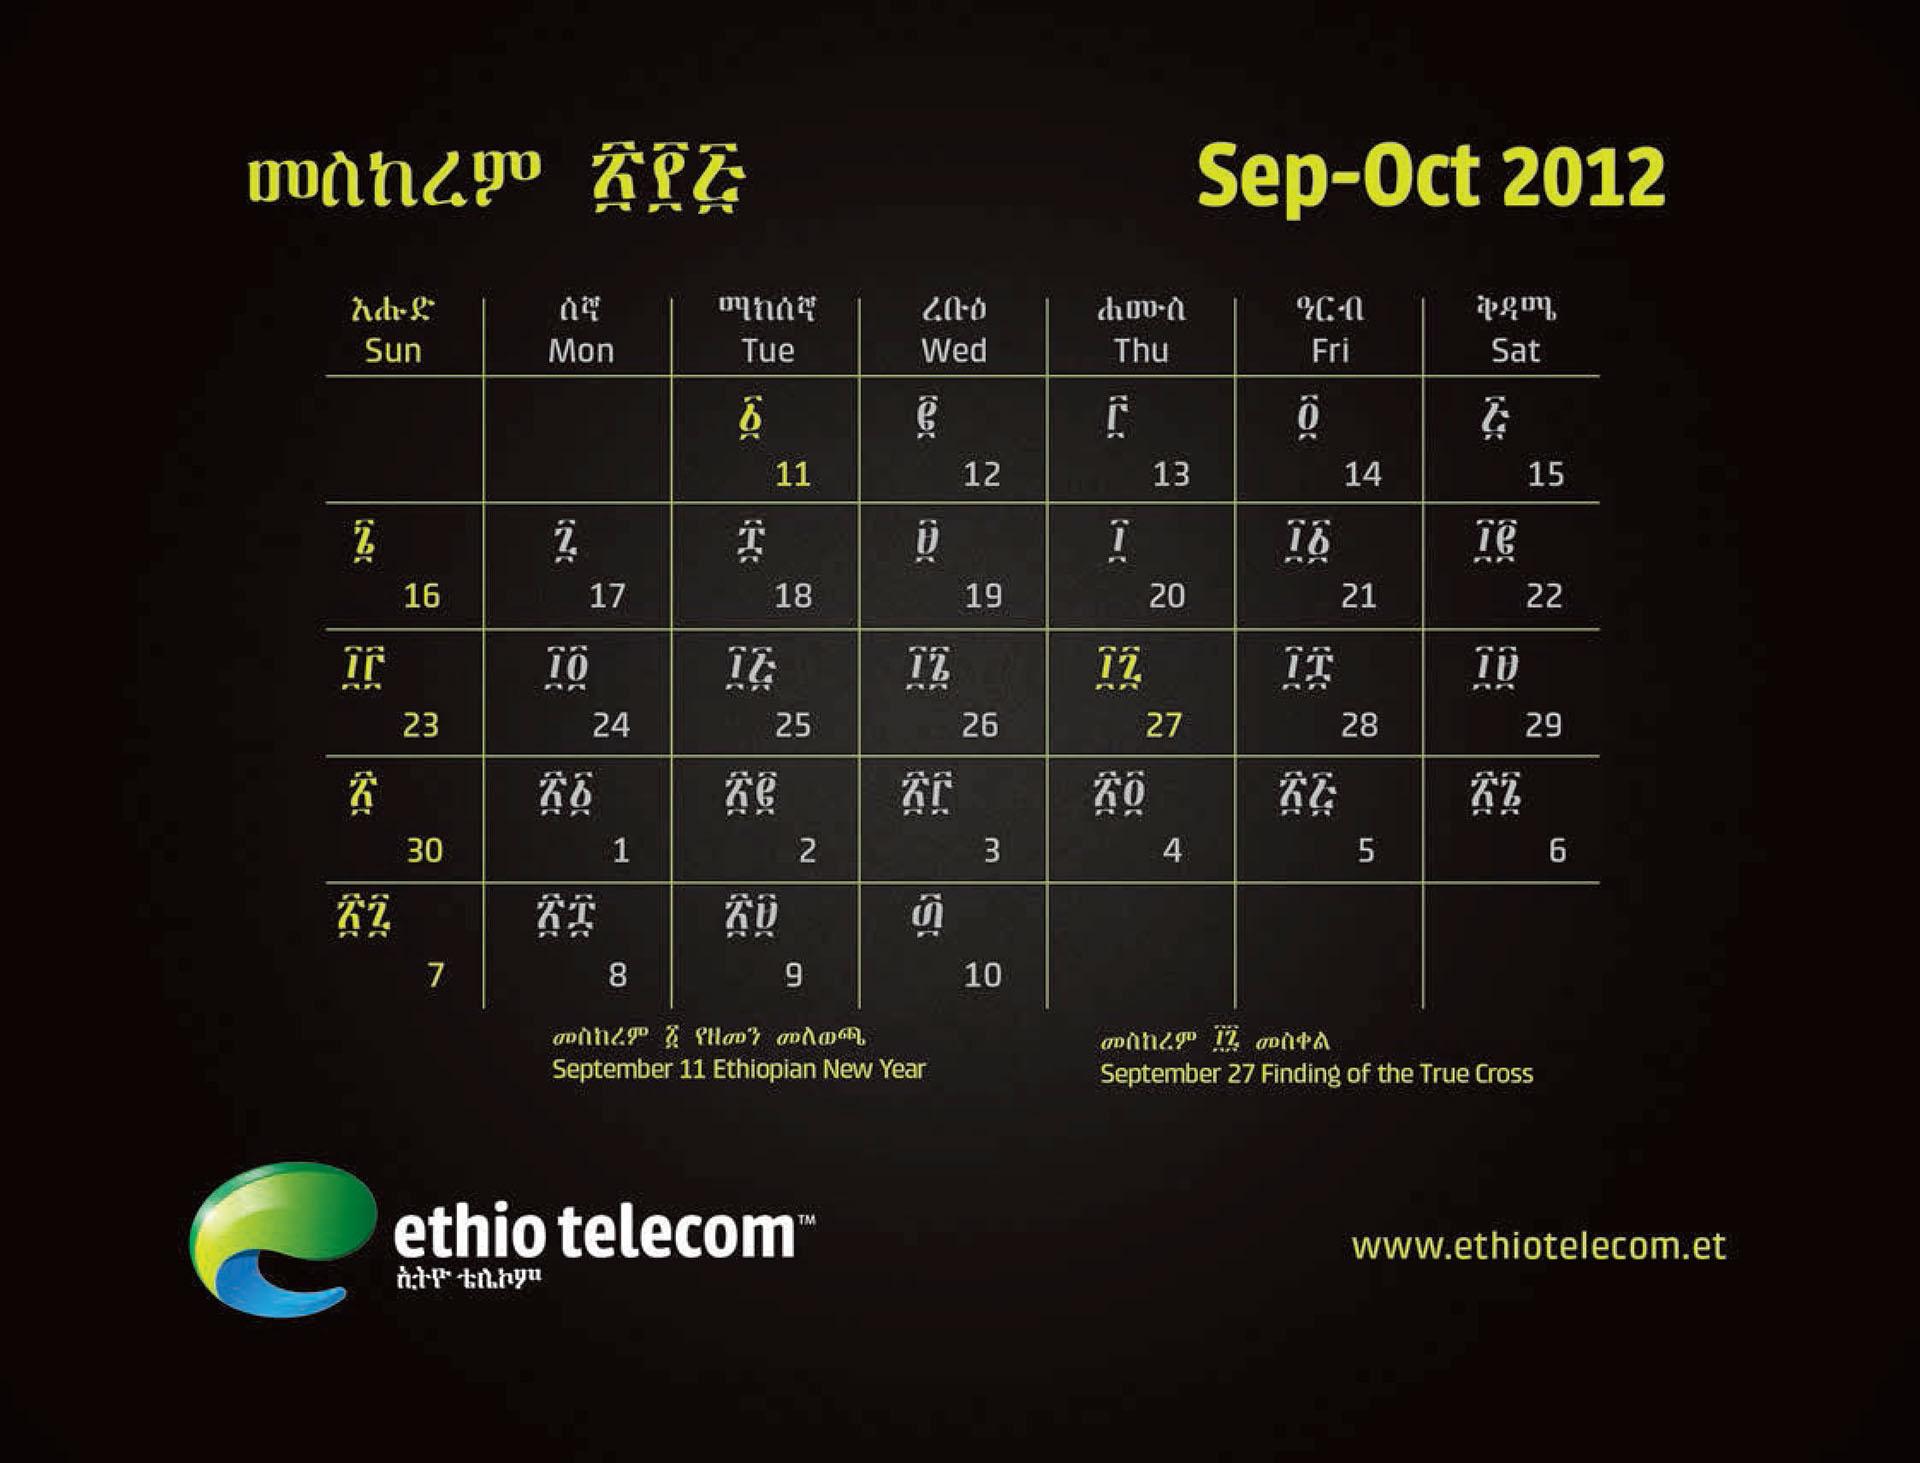 ethio telecom on Behance